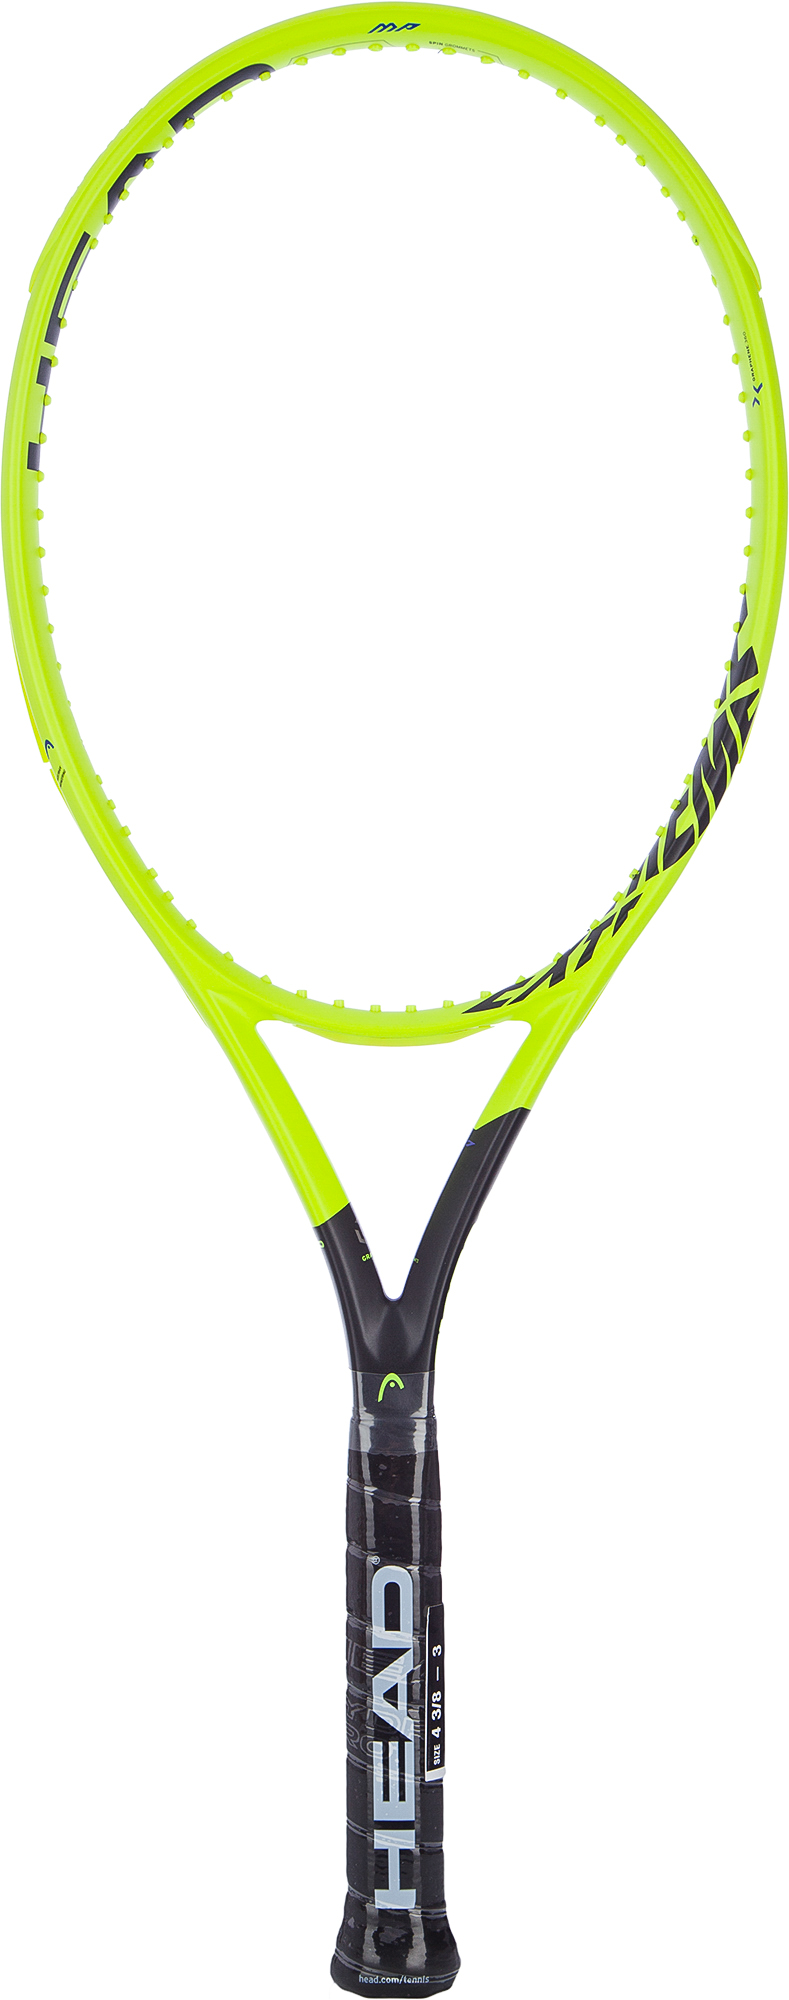 Head Ракетка для большого тенниса Head Graphene 360 Extreme MP head ракетка для большого тенниса head graphene 360 speed lite 27